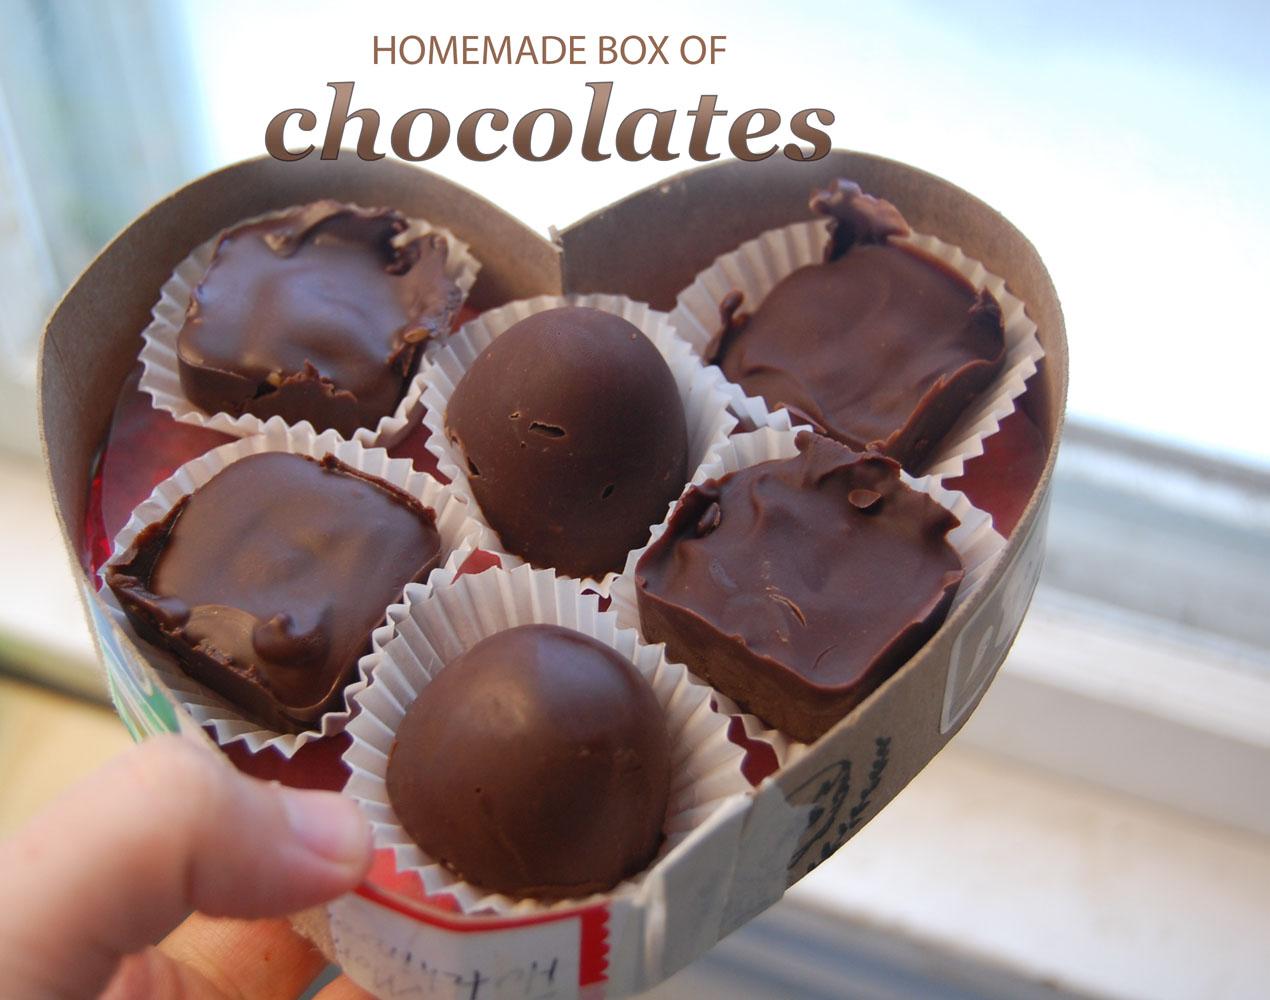 FIESTA CHOCOLATE